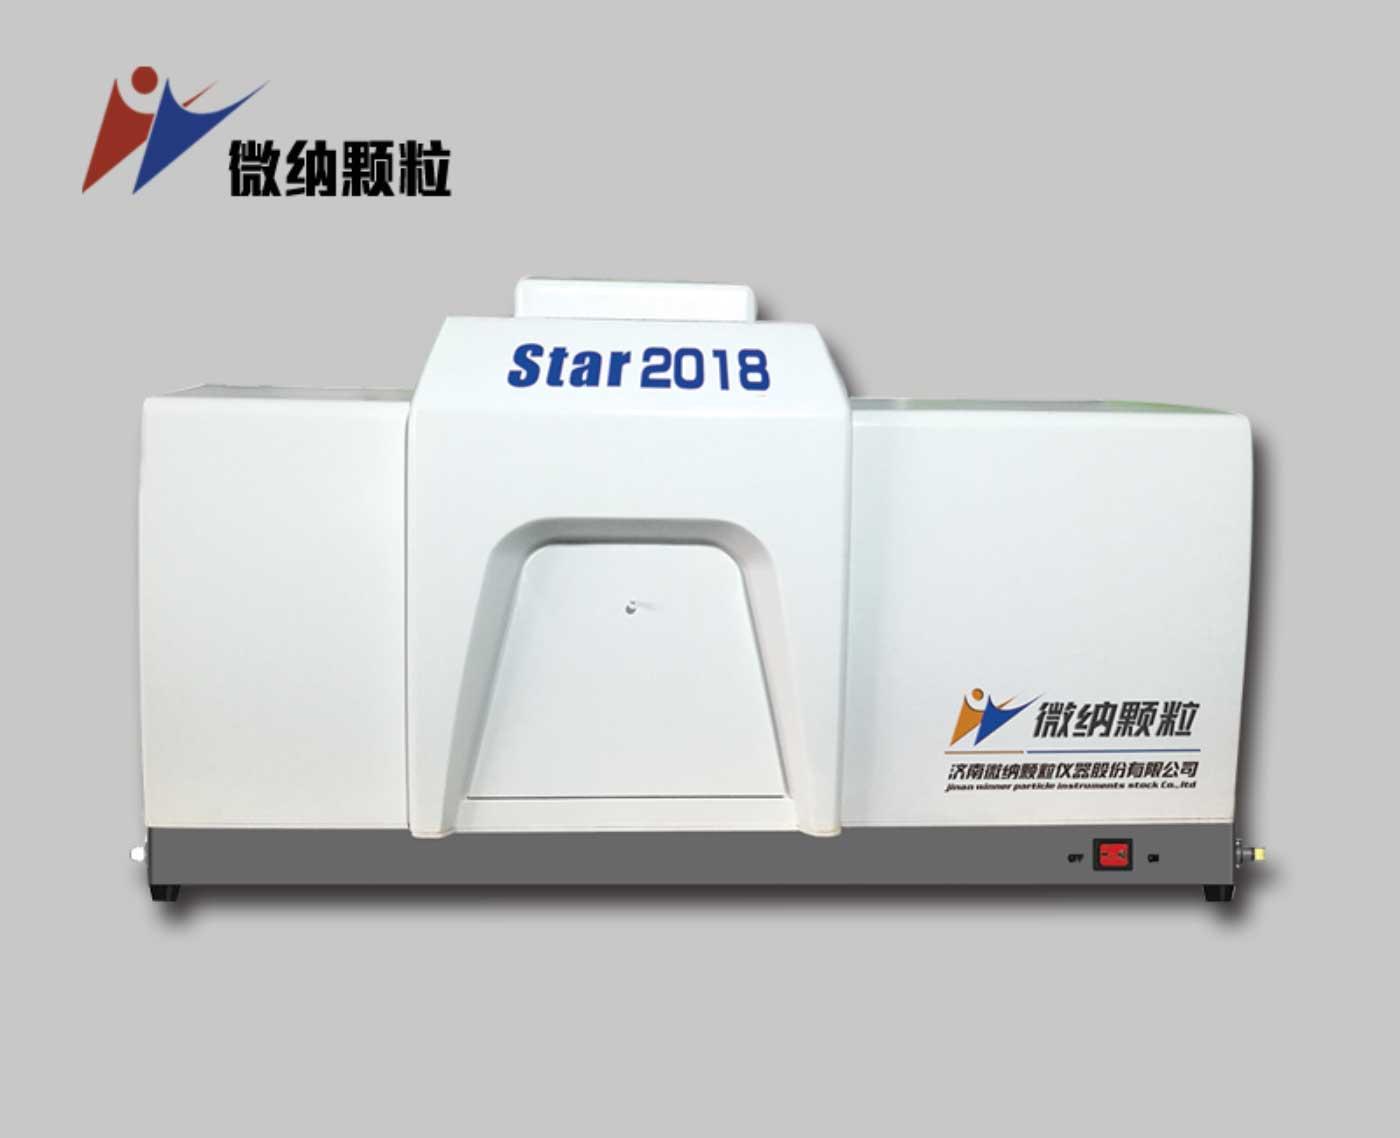 Winner star2018 普及型湿法激光粒度分析仪的图片